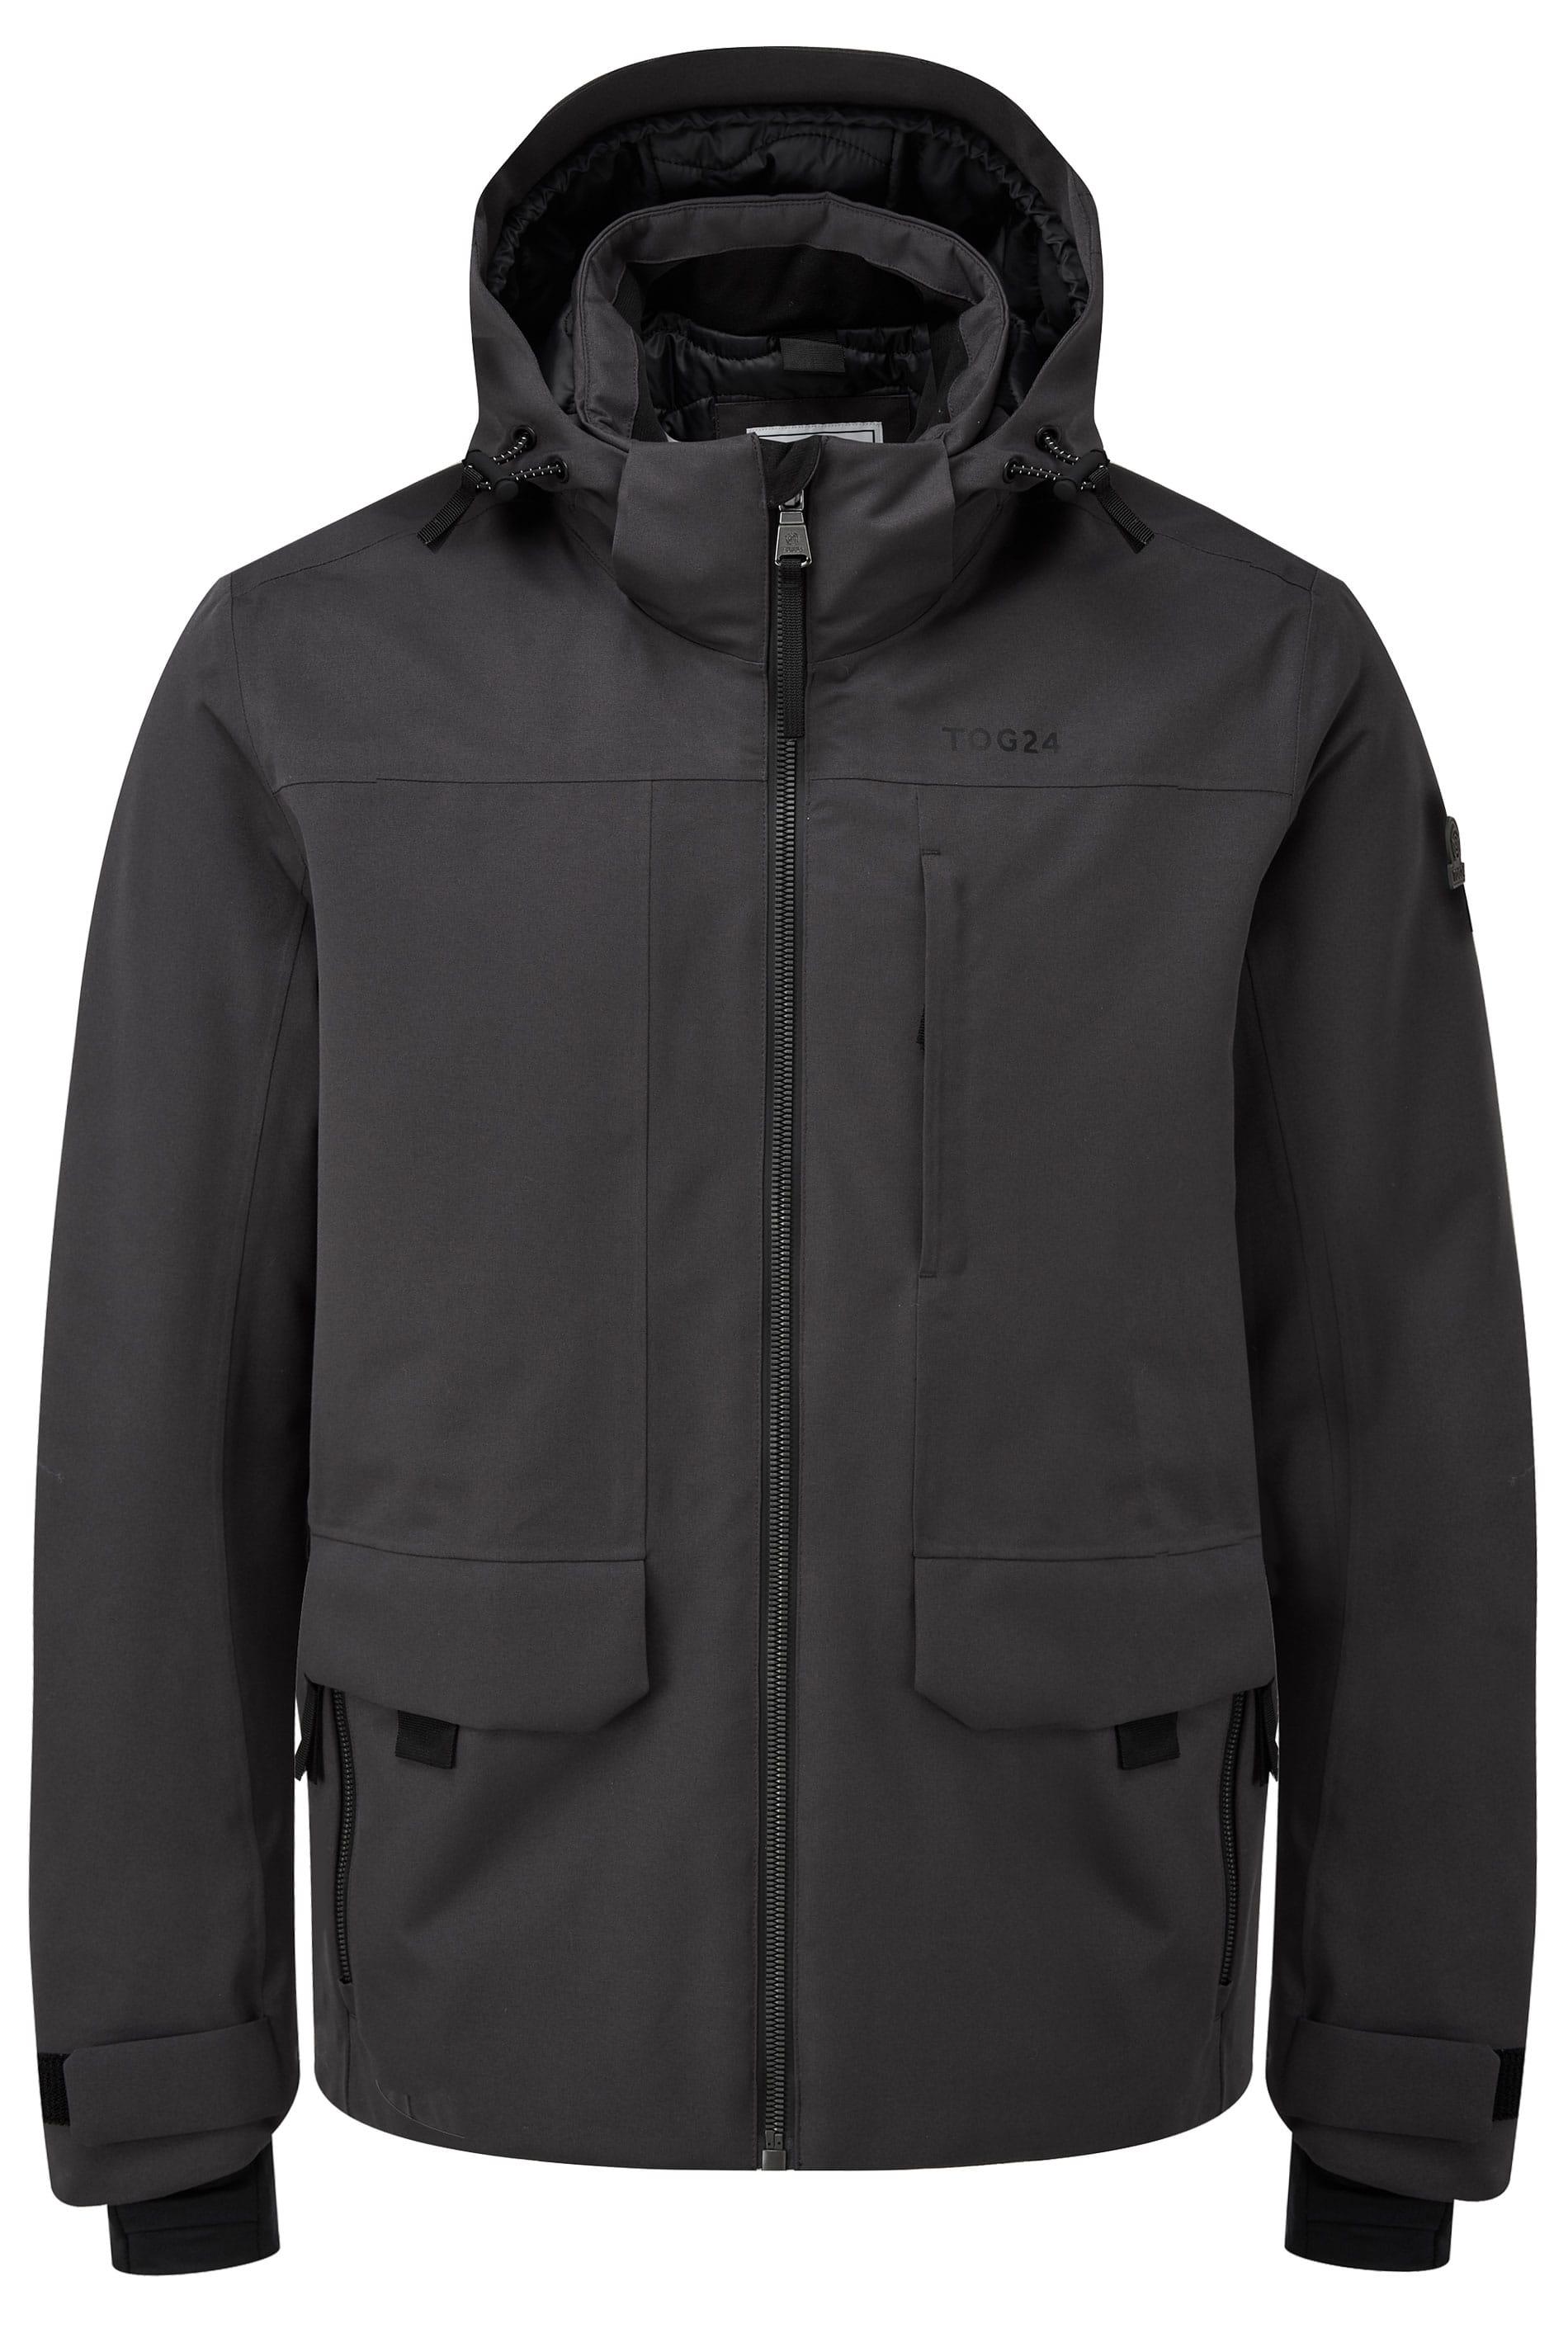 TOG24 Grey Ski Jacket